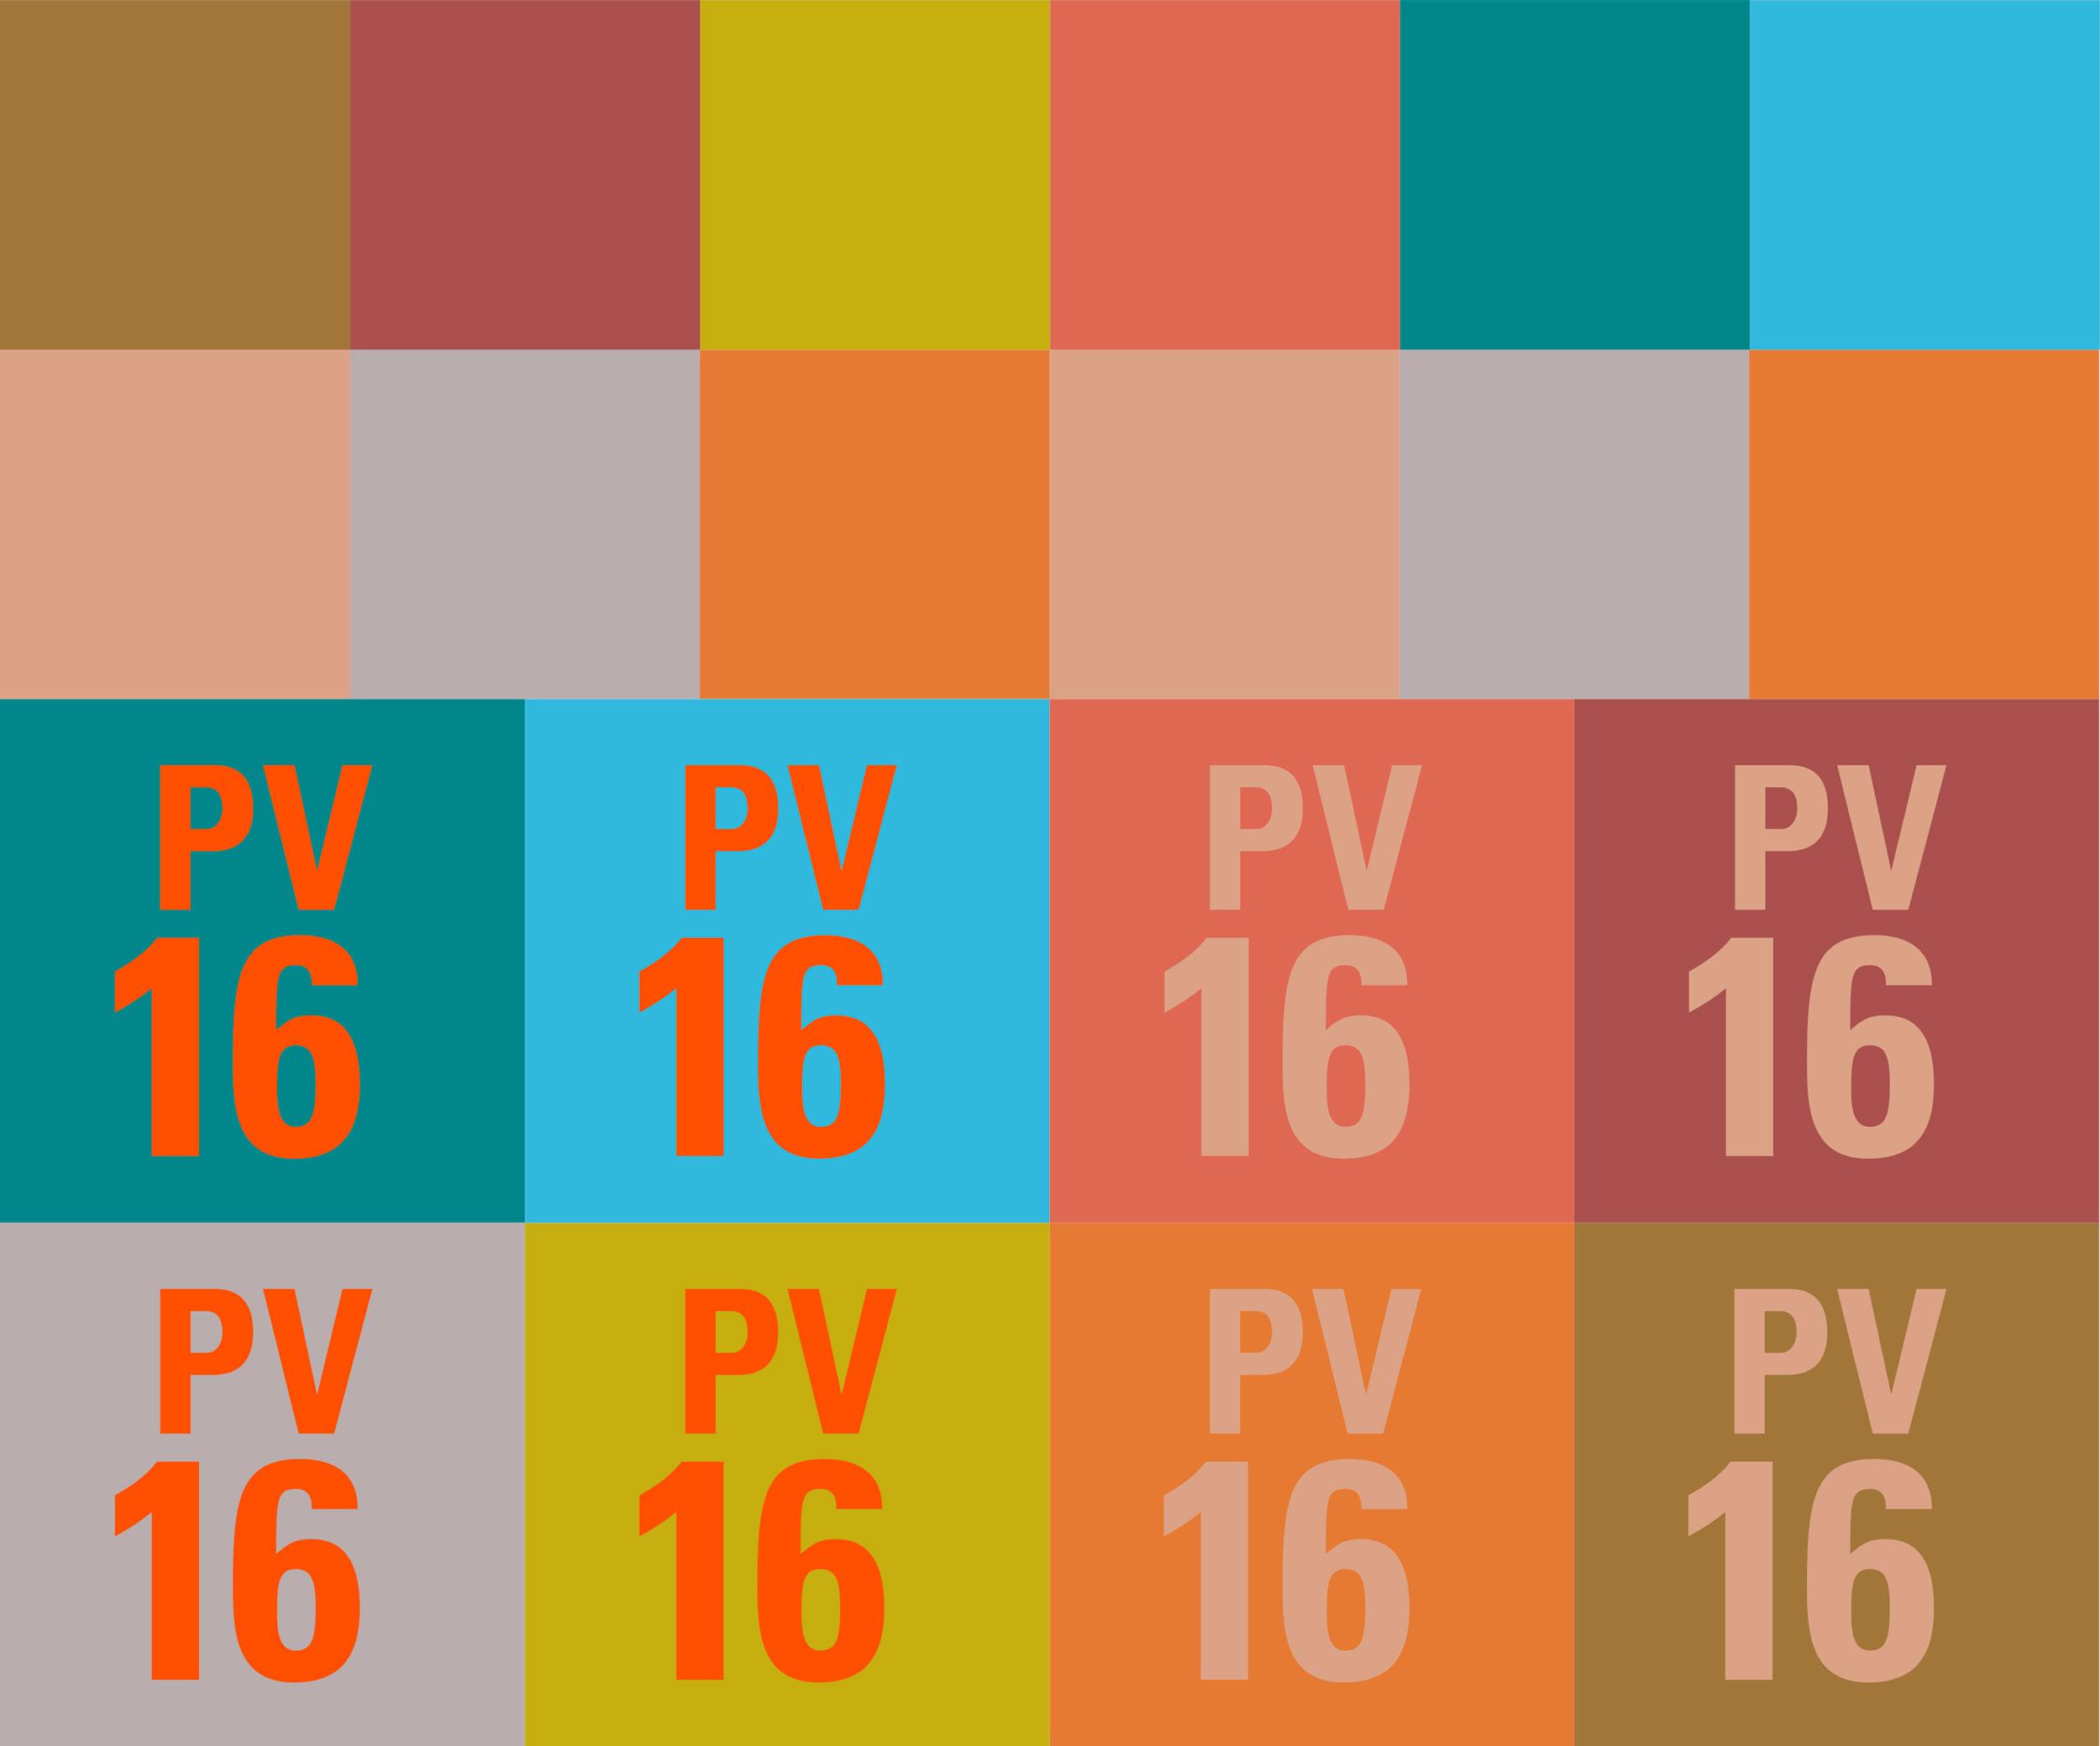 pv2016_portfolio_2016_color_palette_rgc.jpg